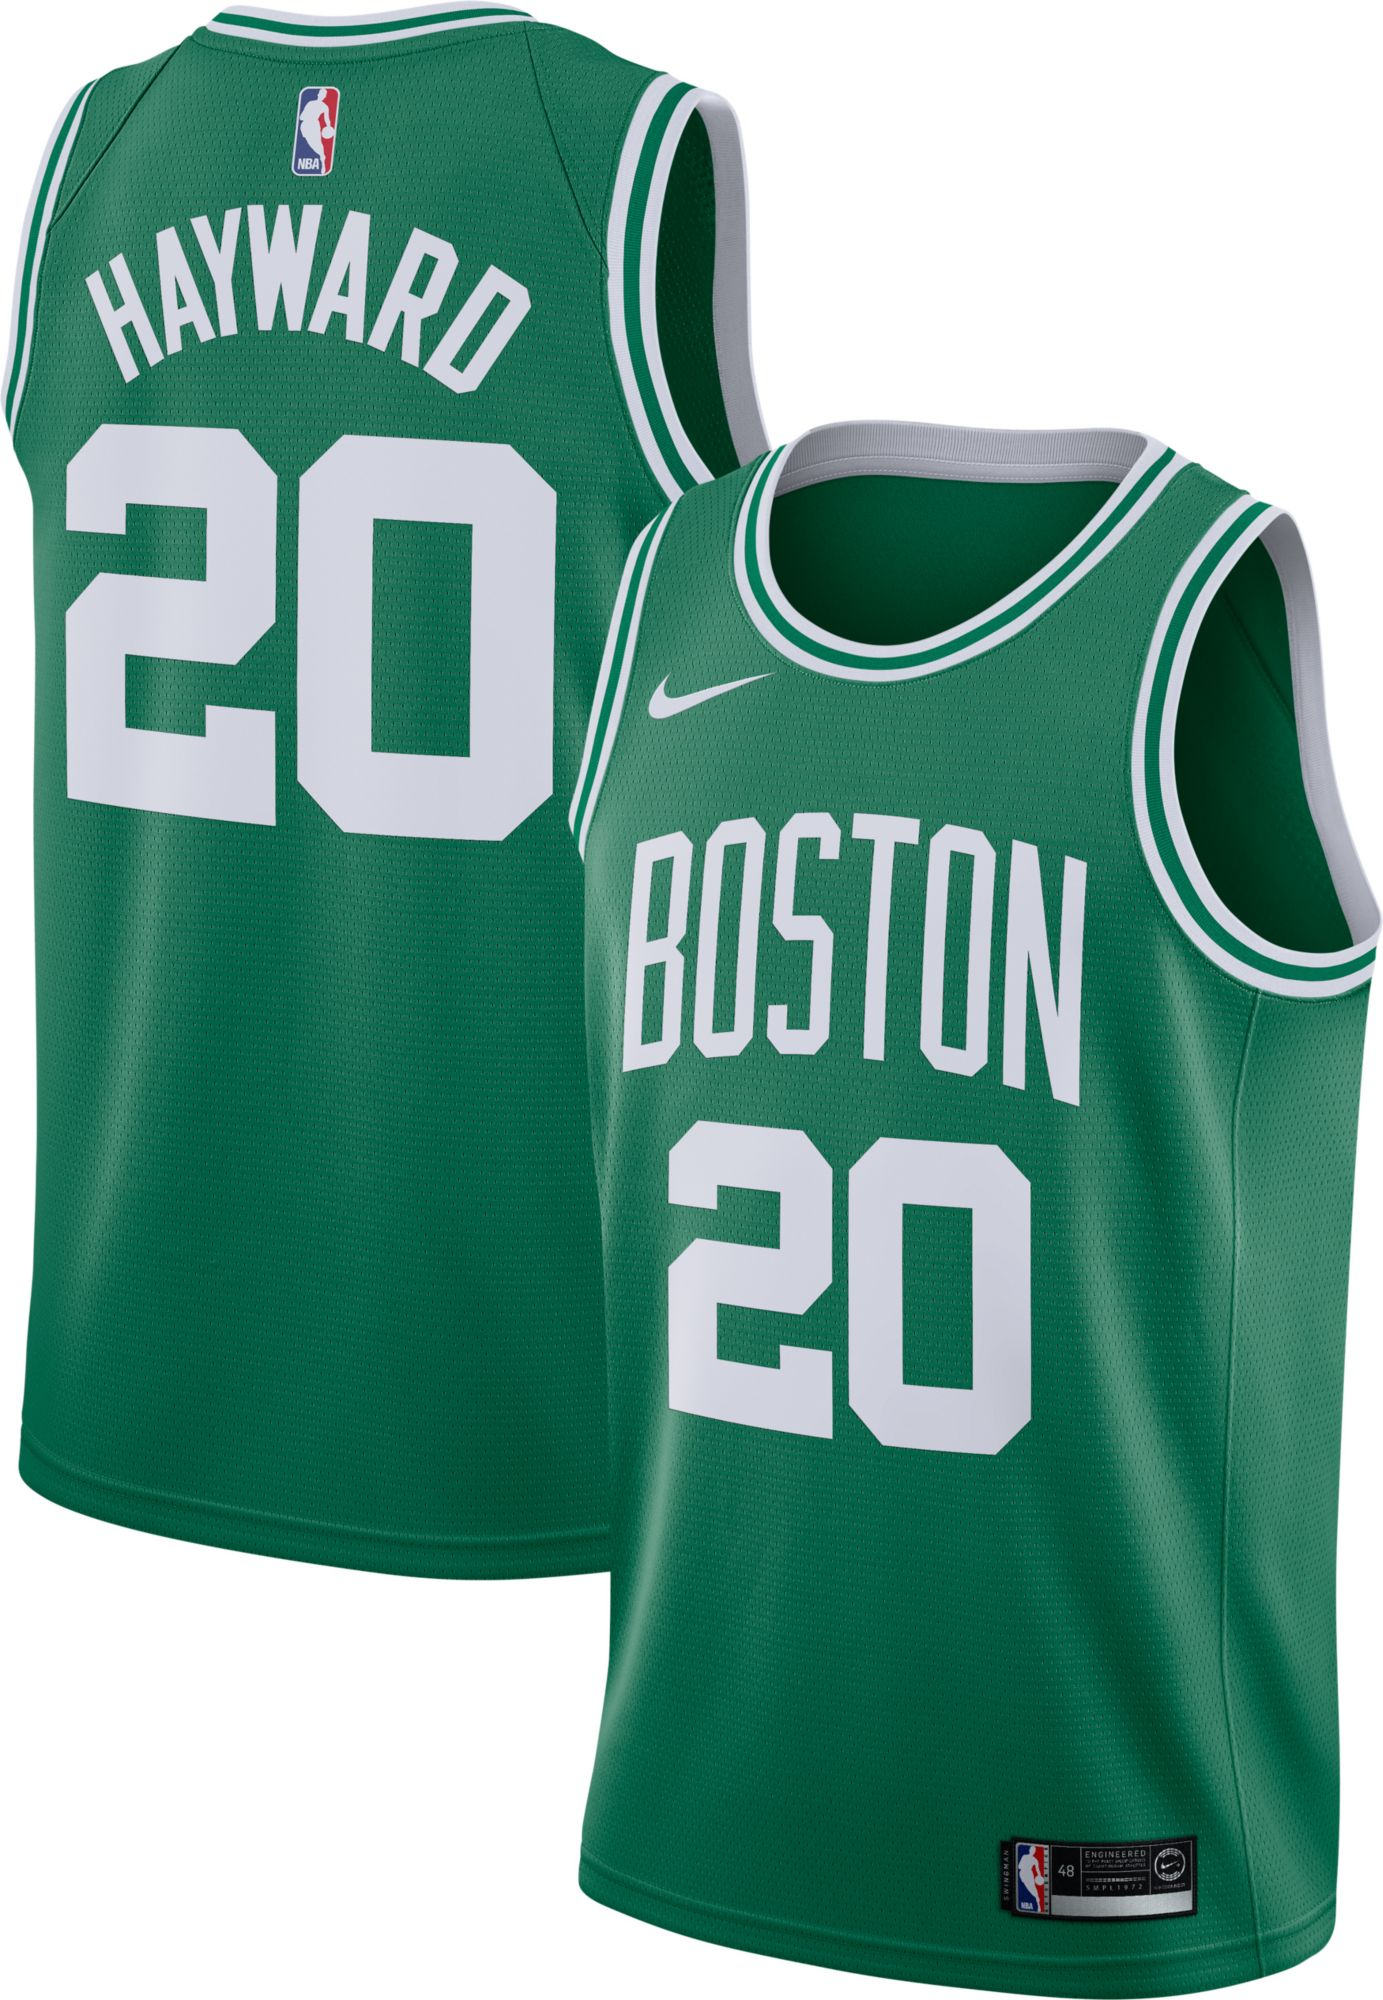 3991005f3d1 ... Nike Mens Boston Celtics Gordon Hayward 20 Kelly Green Dri-FIT Swingman  Jersey ...